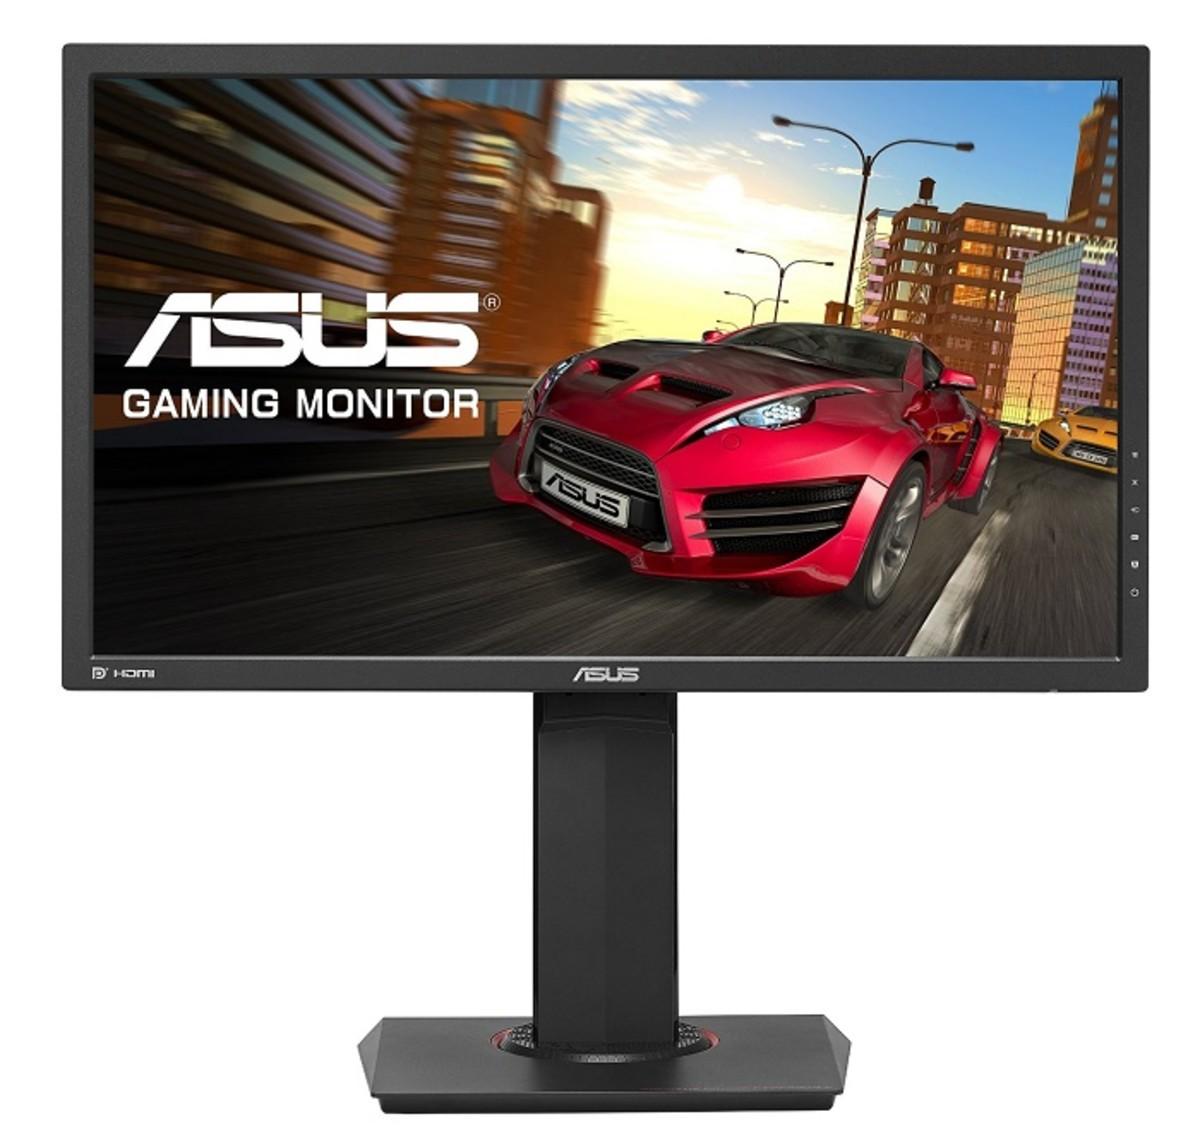 top-ips-gaming-monitor-responsiveness